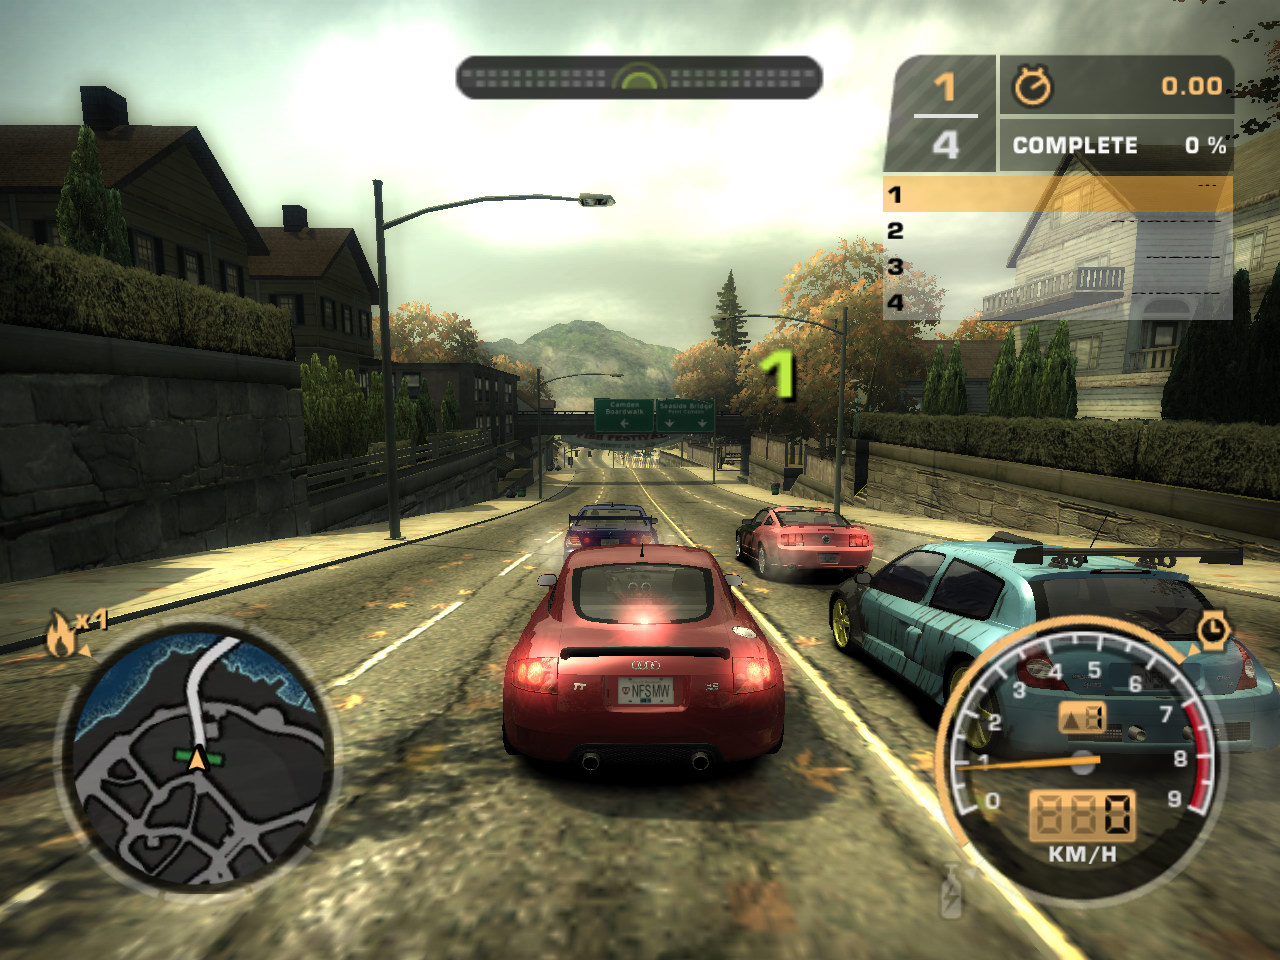 Какие есть игры need for speed